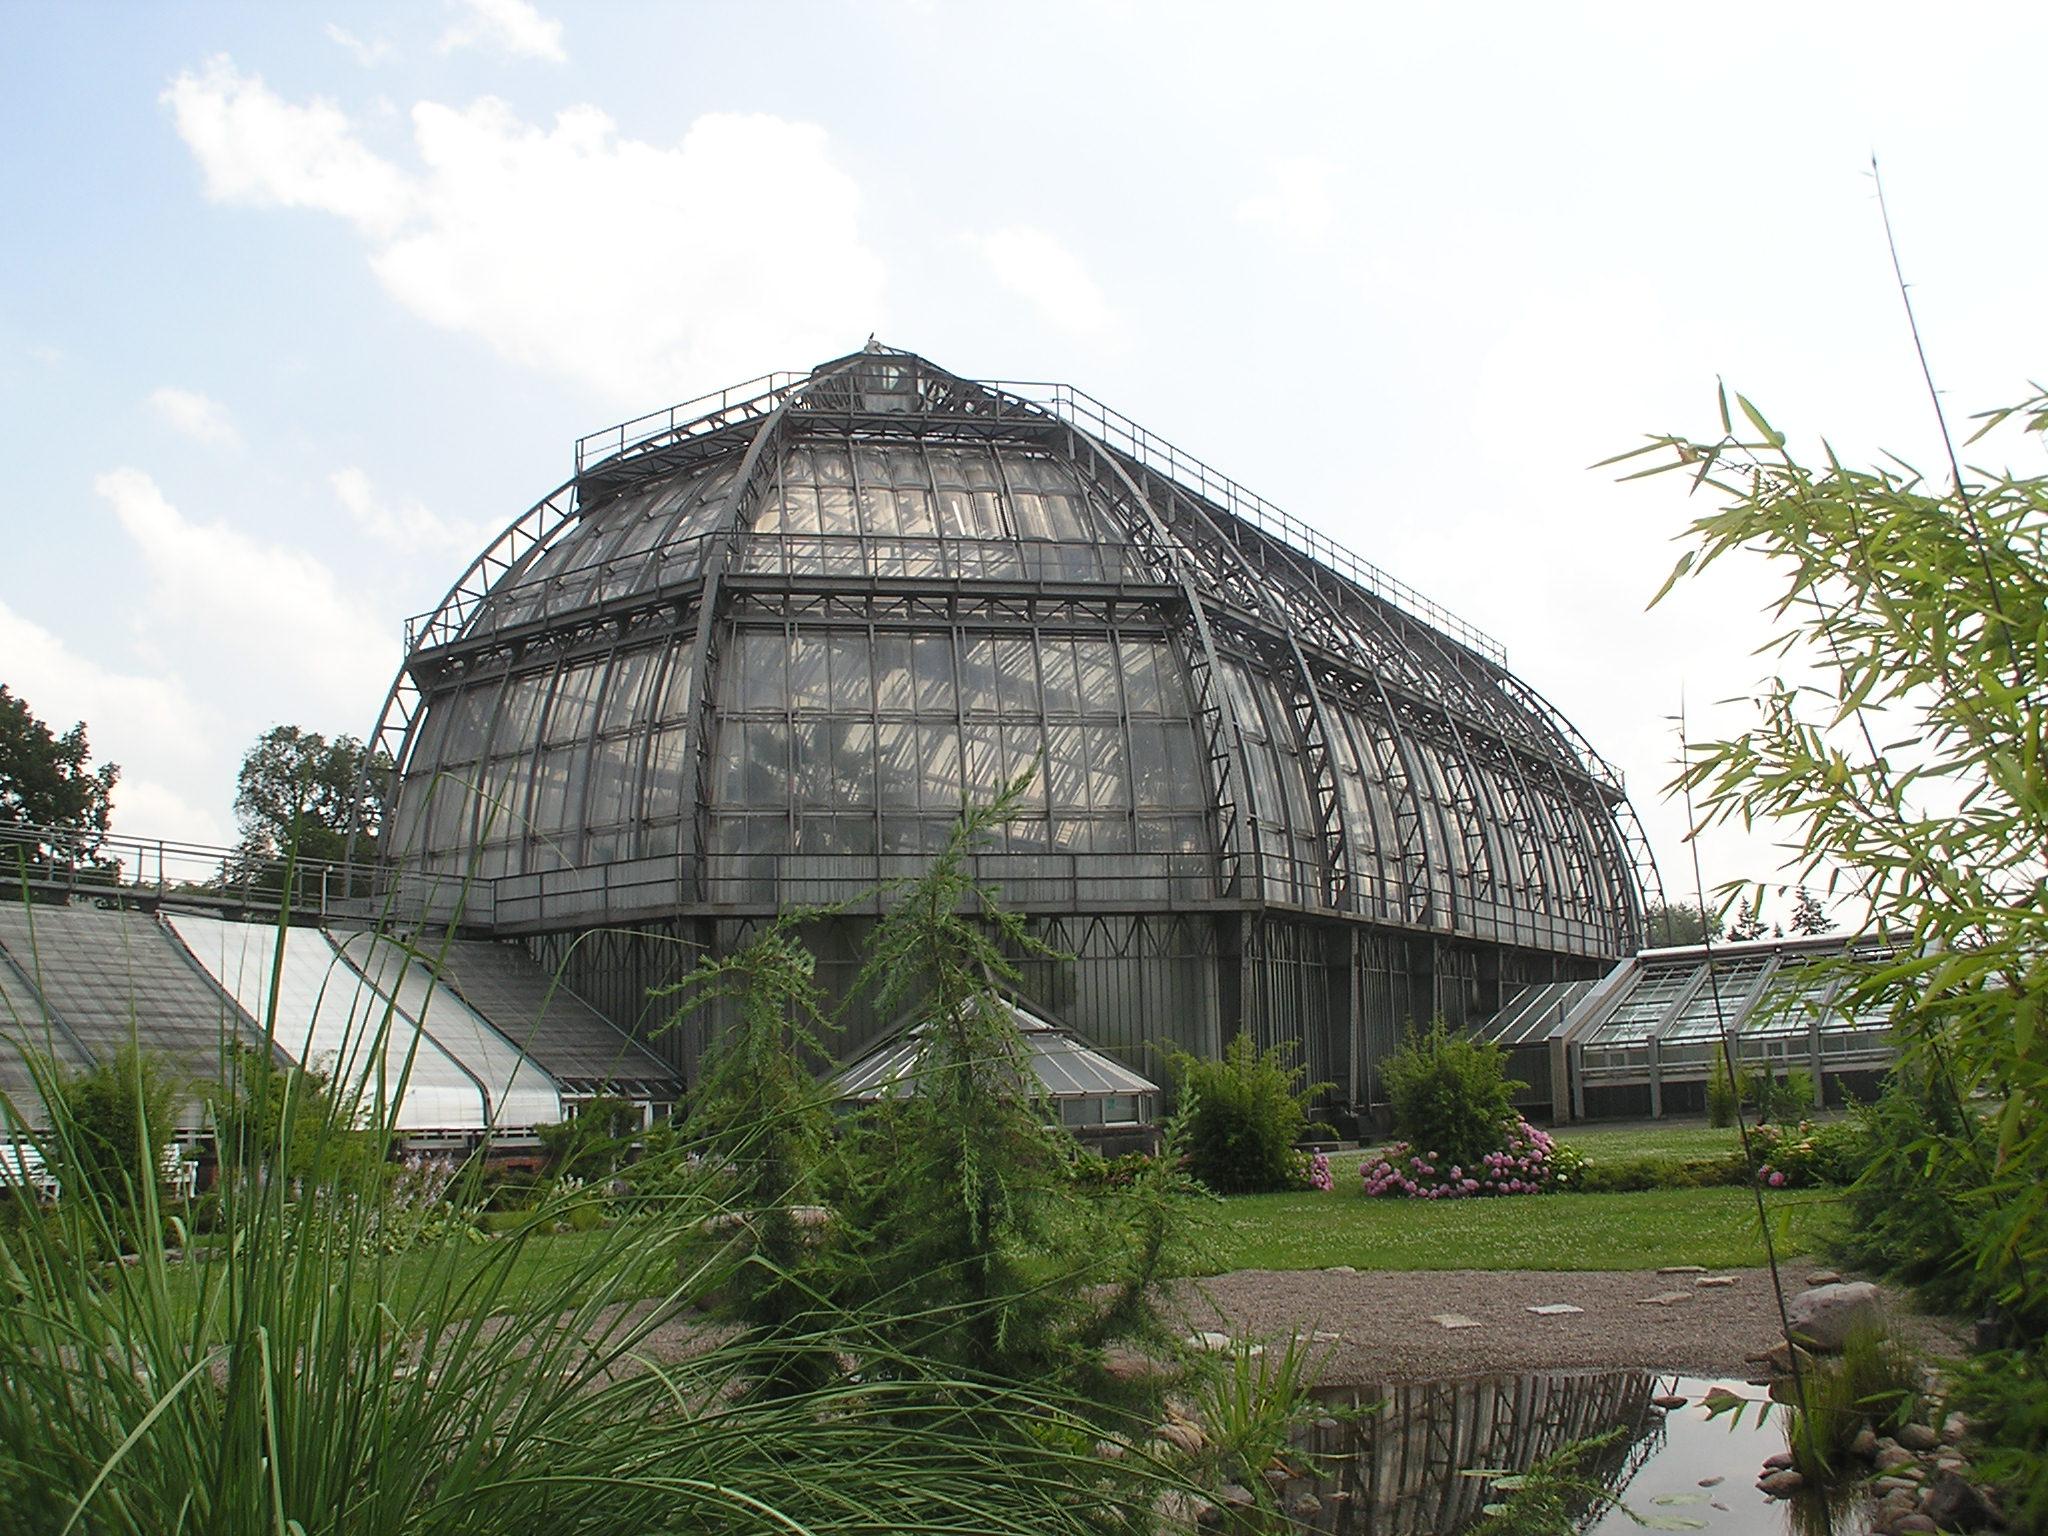 File:2006-07-08 Botanischer-garten Grosses-tropenhaus.jpg